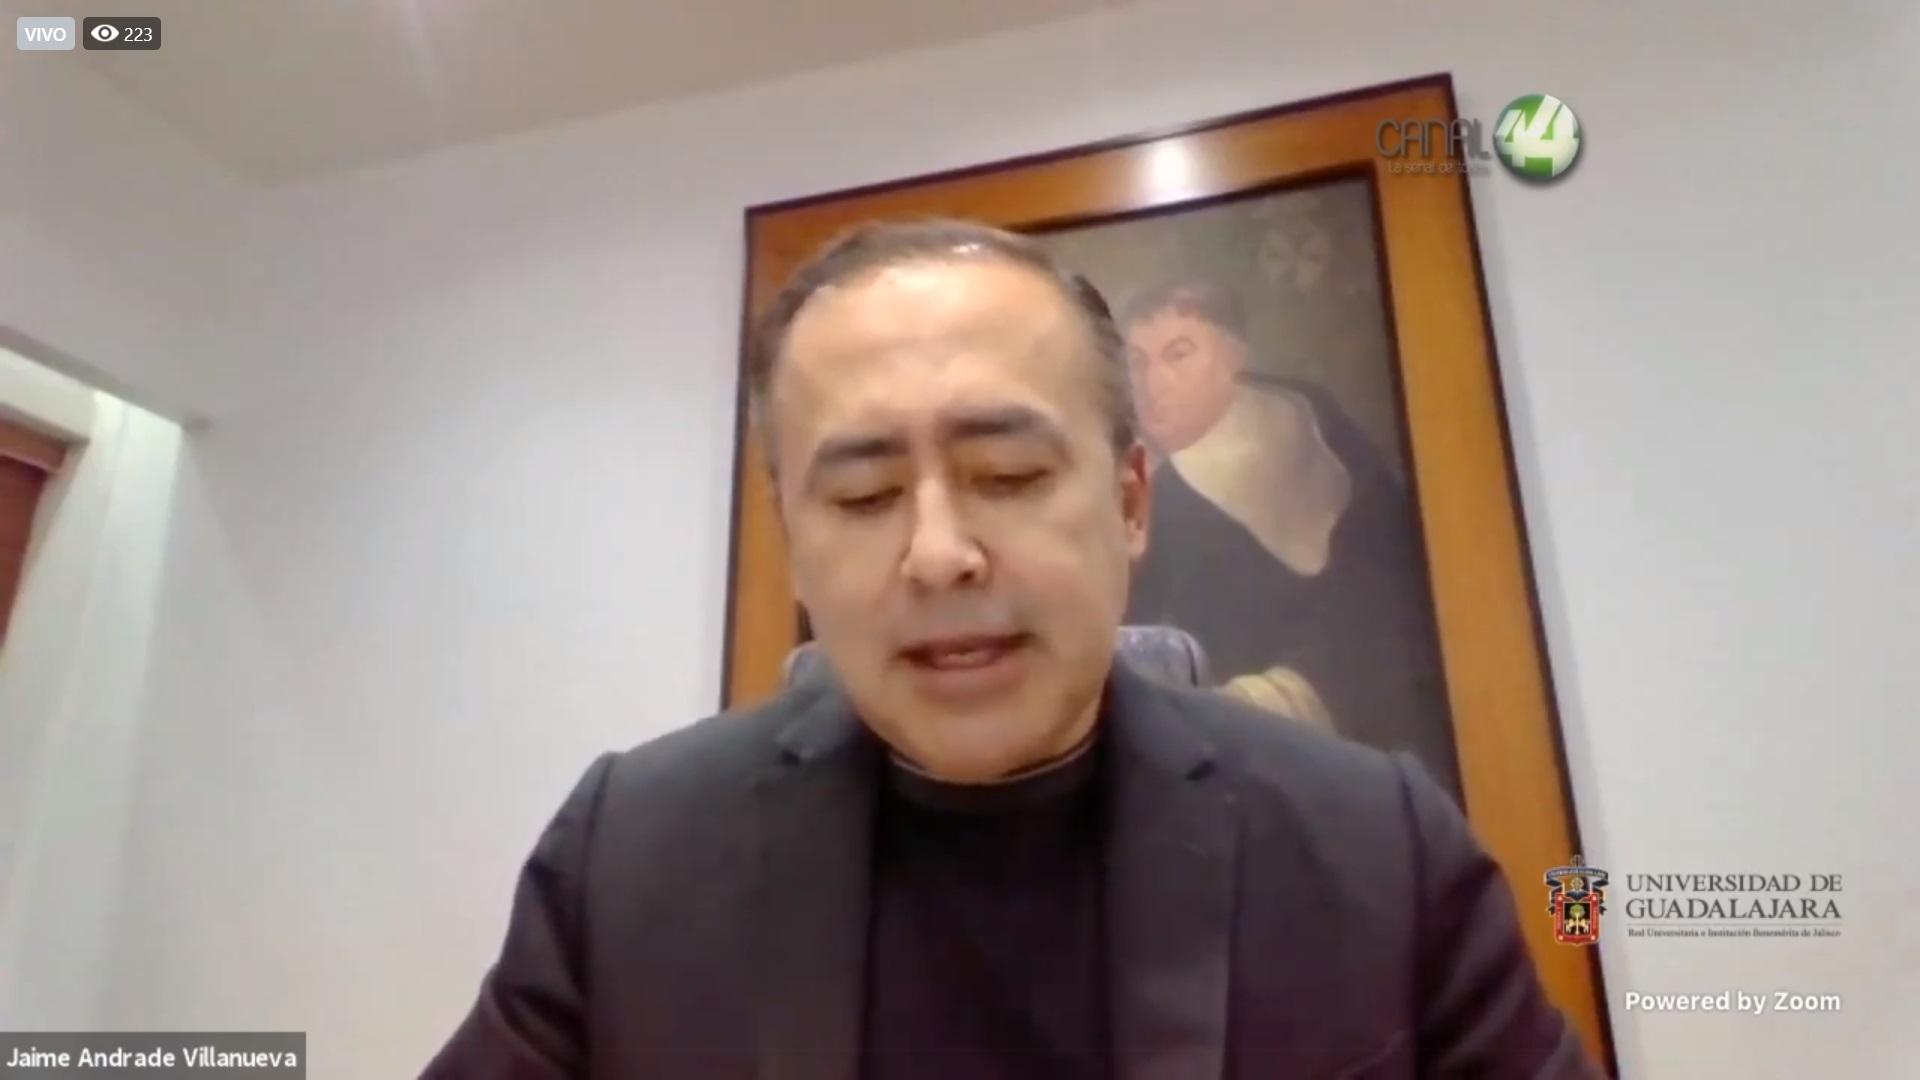 El Director General del OPD Hospital Civil de Guadalajara el doctor Jaime Federico Andrade Villanueva